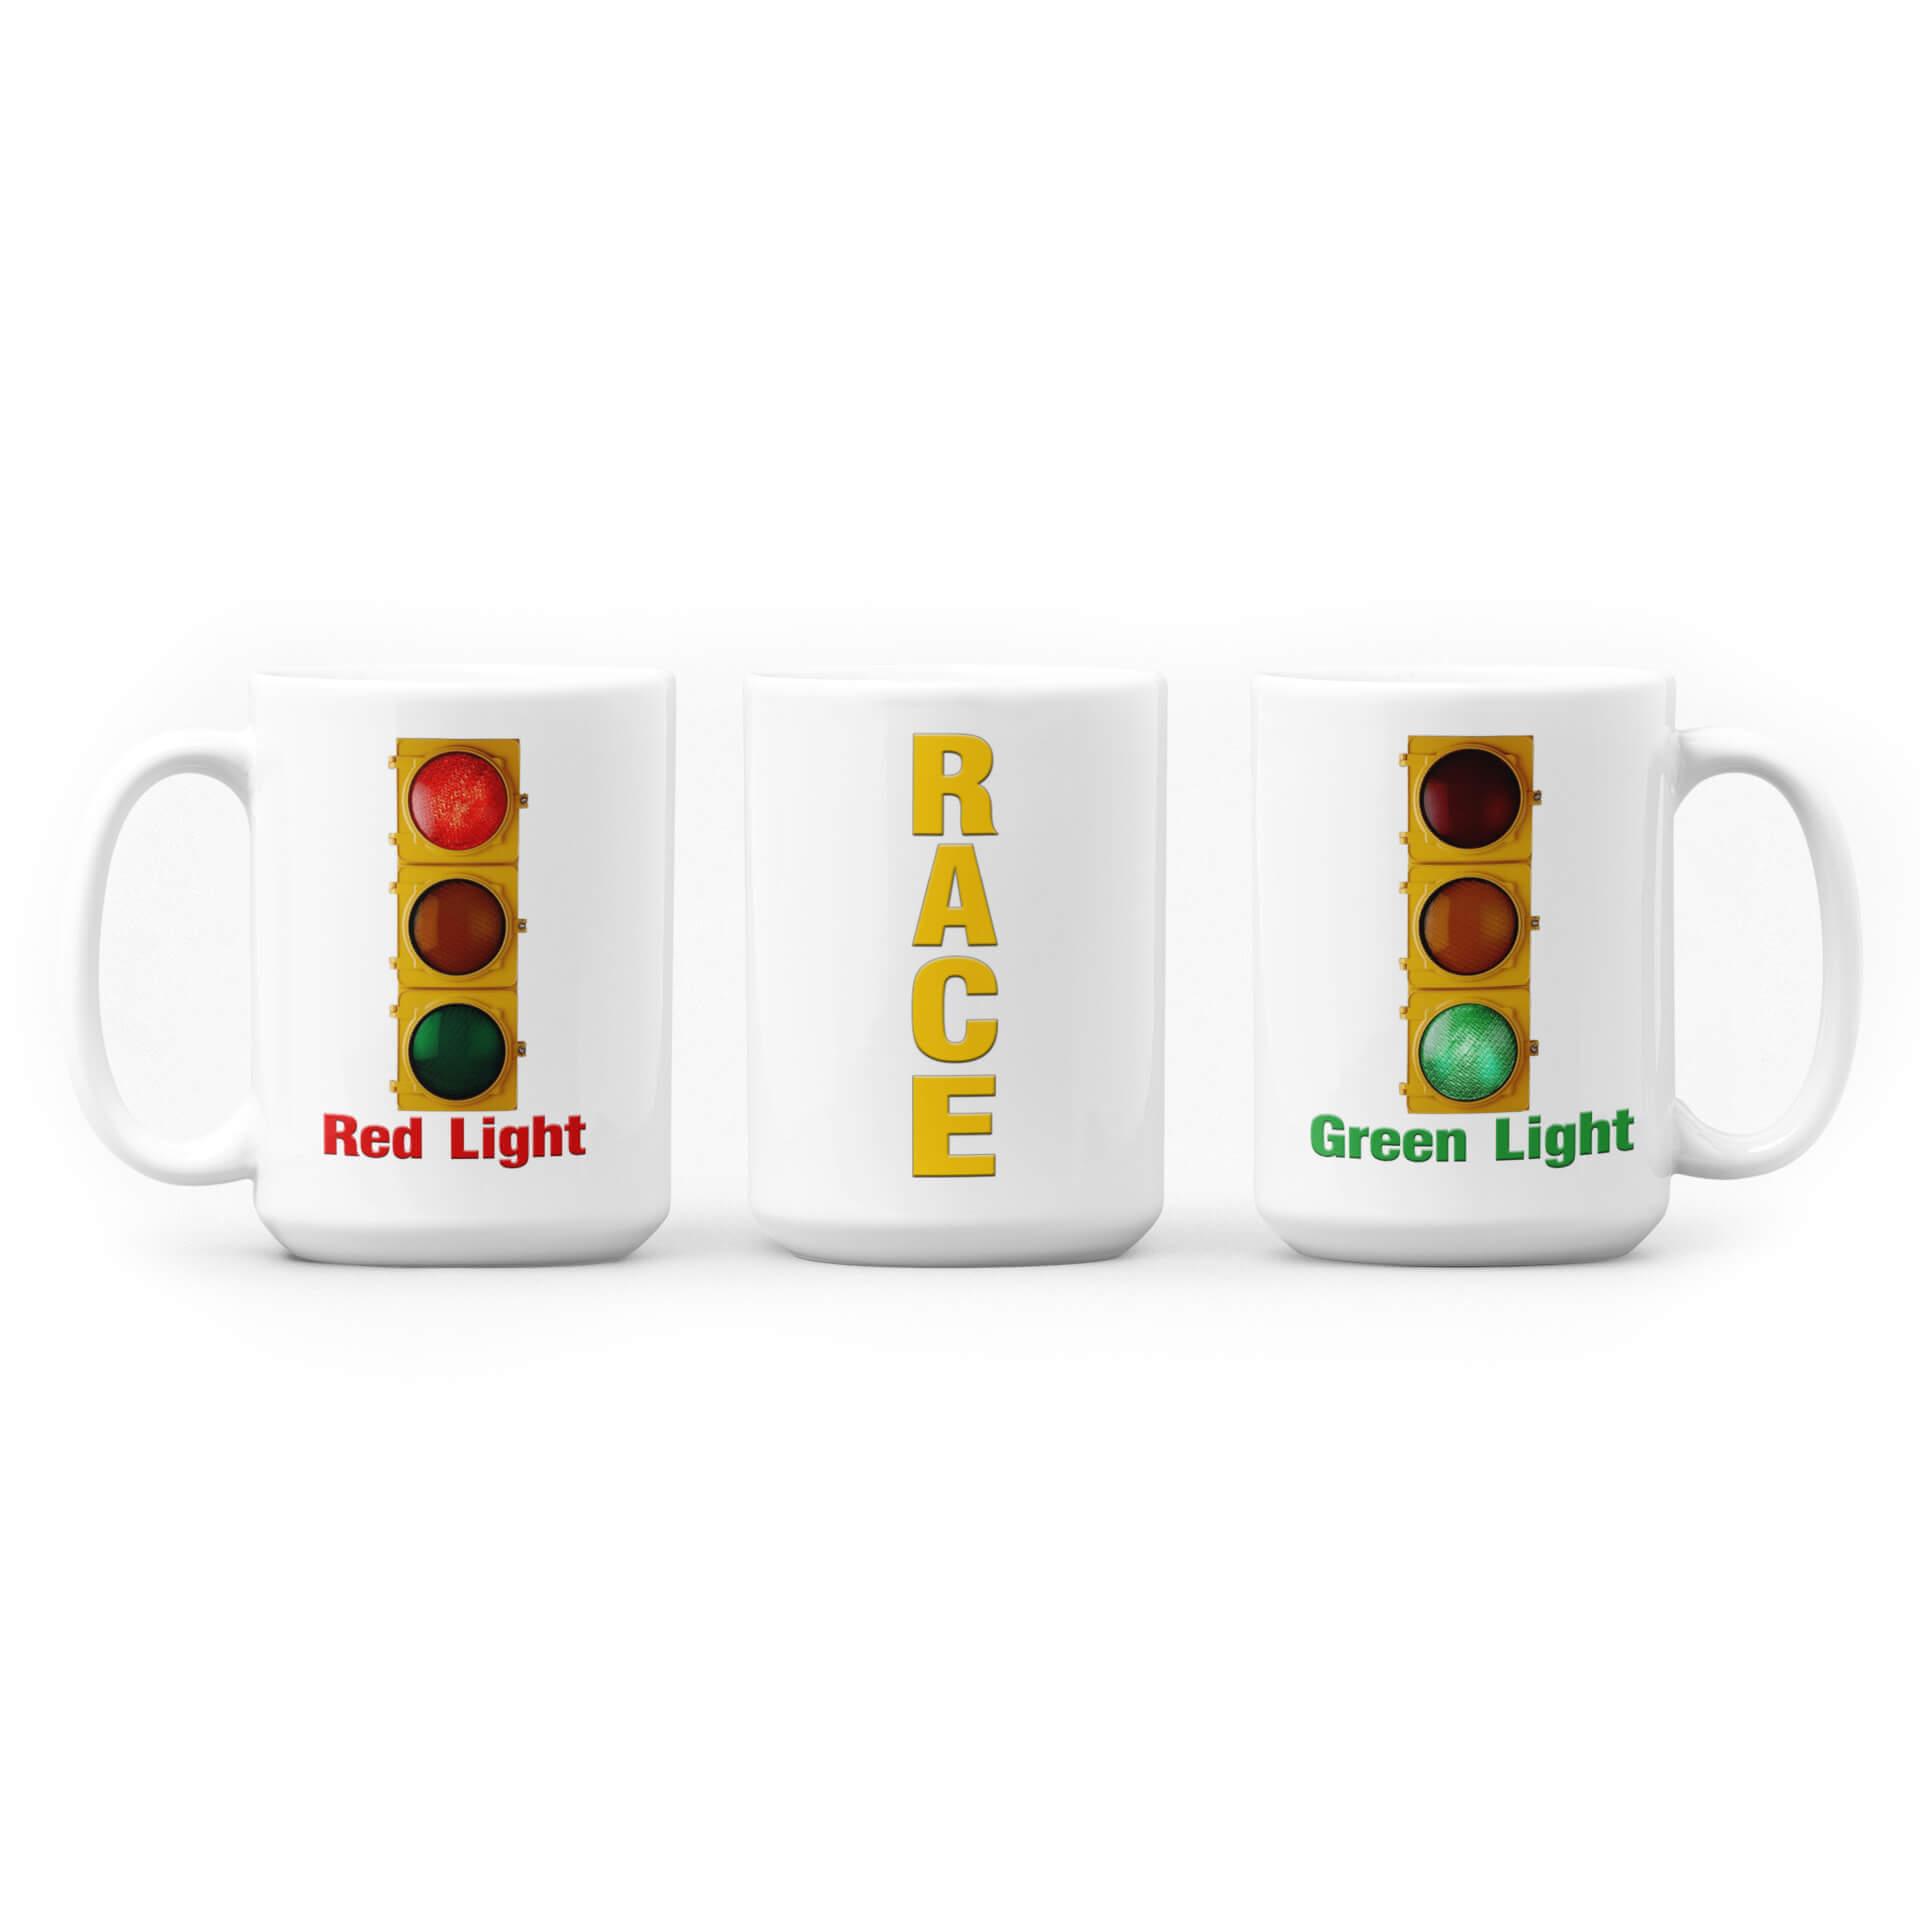 Red Light - Green Light: Race Mug